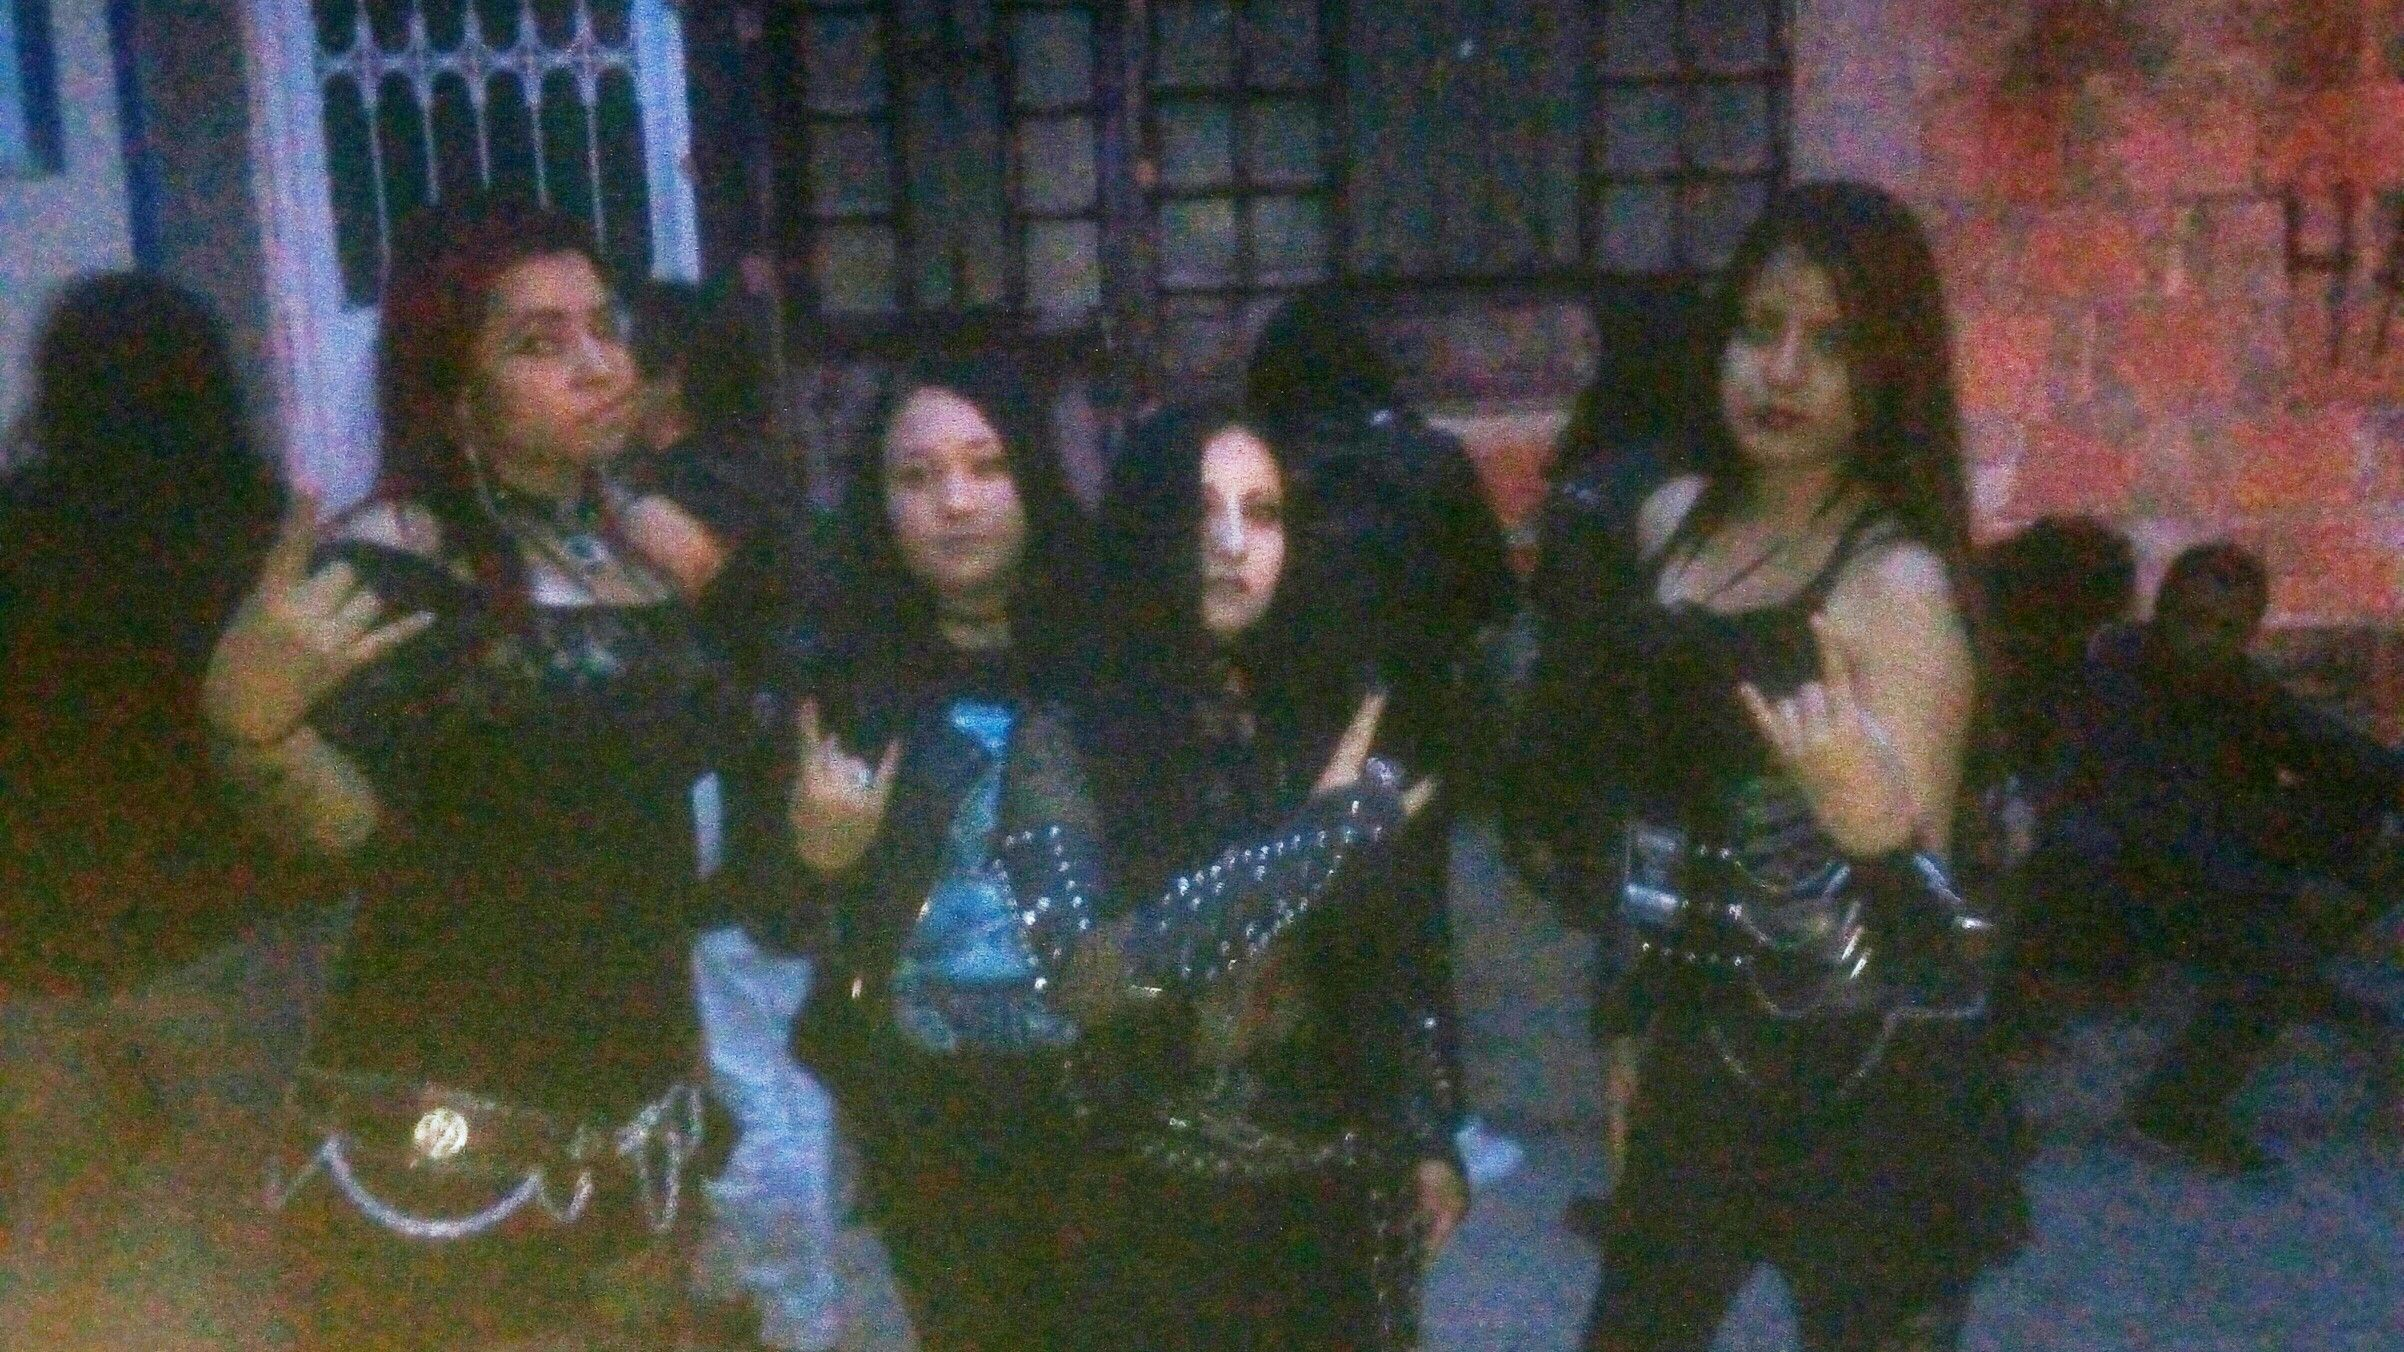 Ginger Adriana. Me tomé esta fotillo junto a Fedra   el 11 de marzo del 2017 en el evento Artpocalispsis Metal Fest.